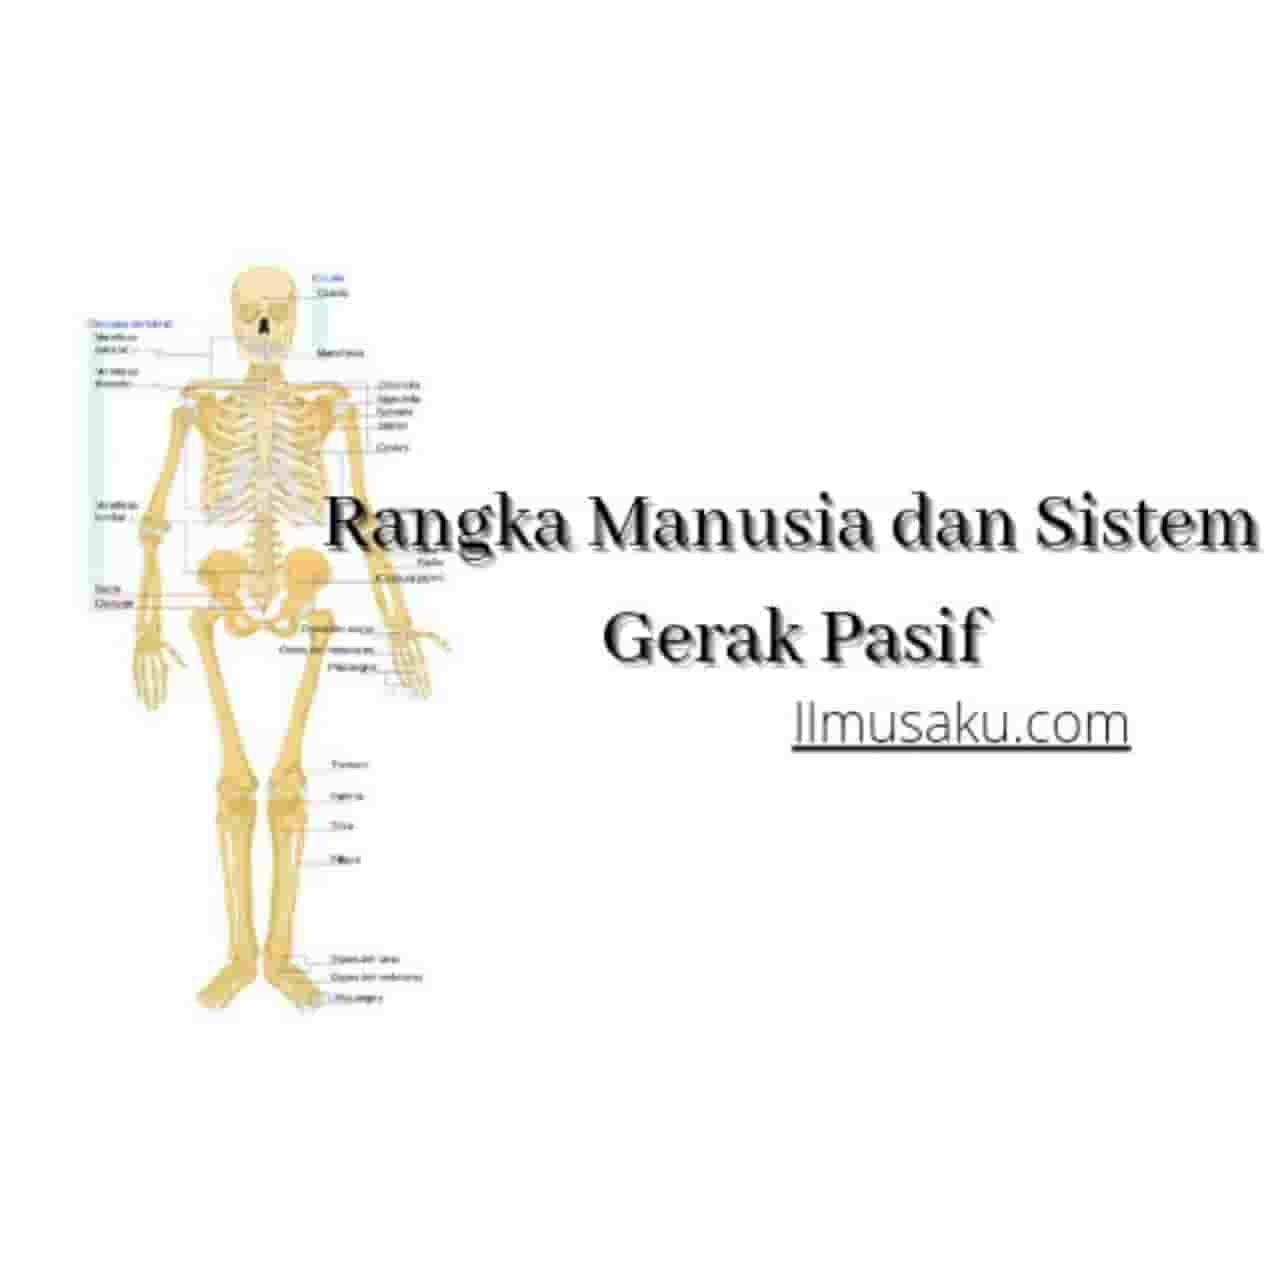 Rangka Manusia dan Sistem Gerak Pasif